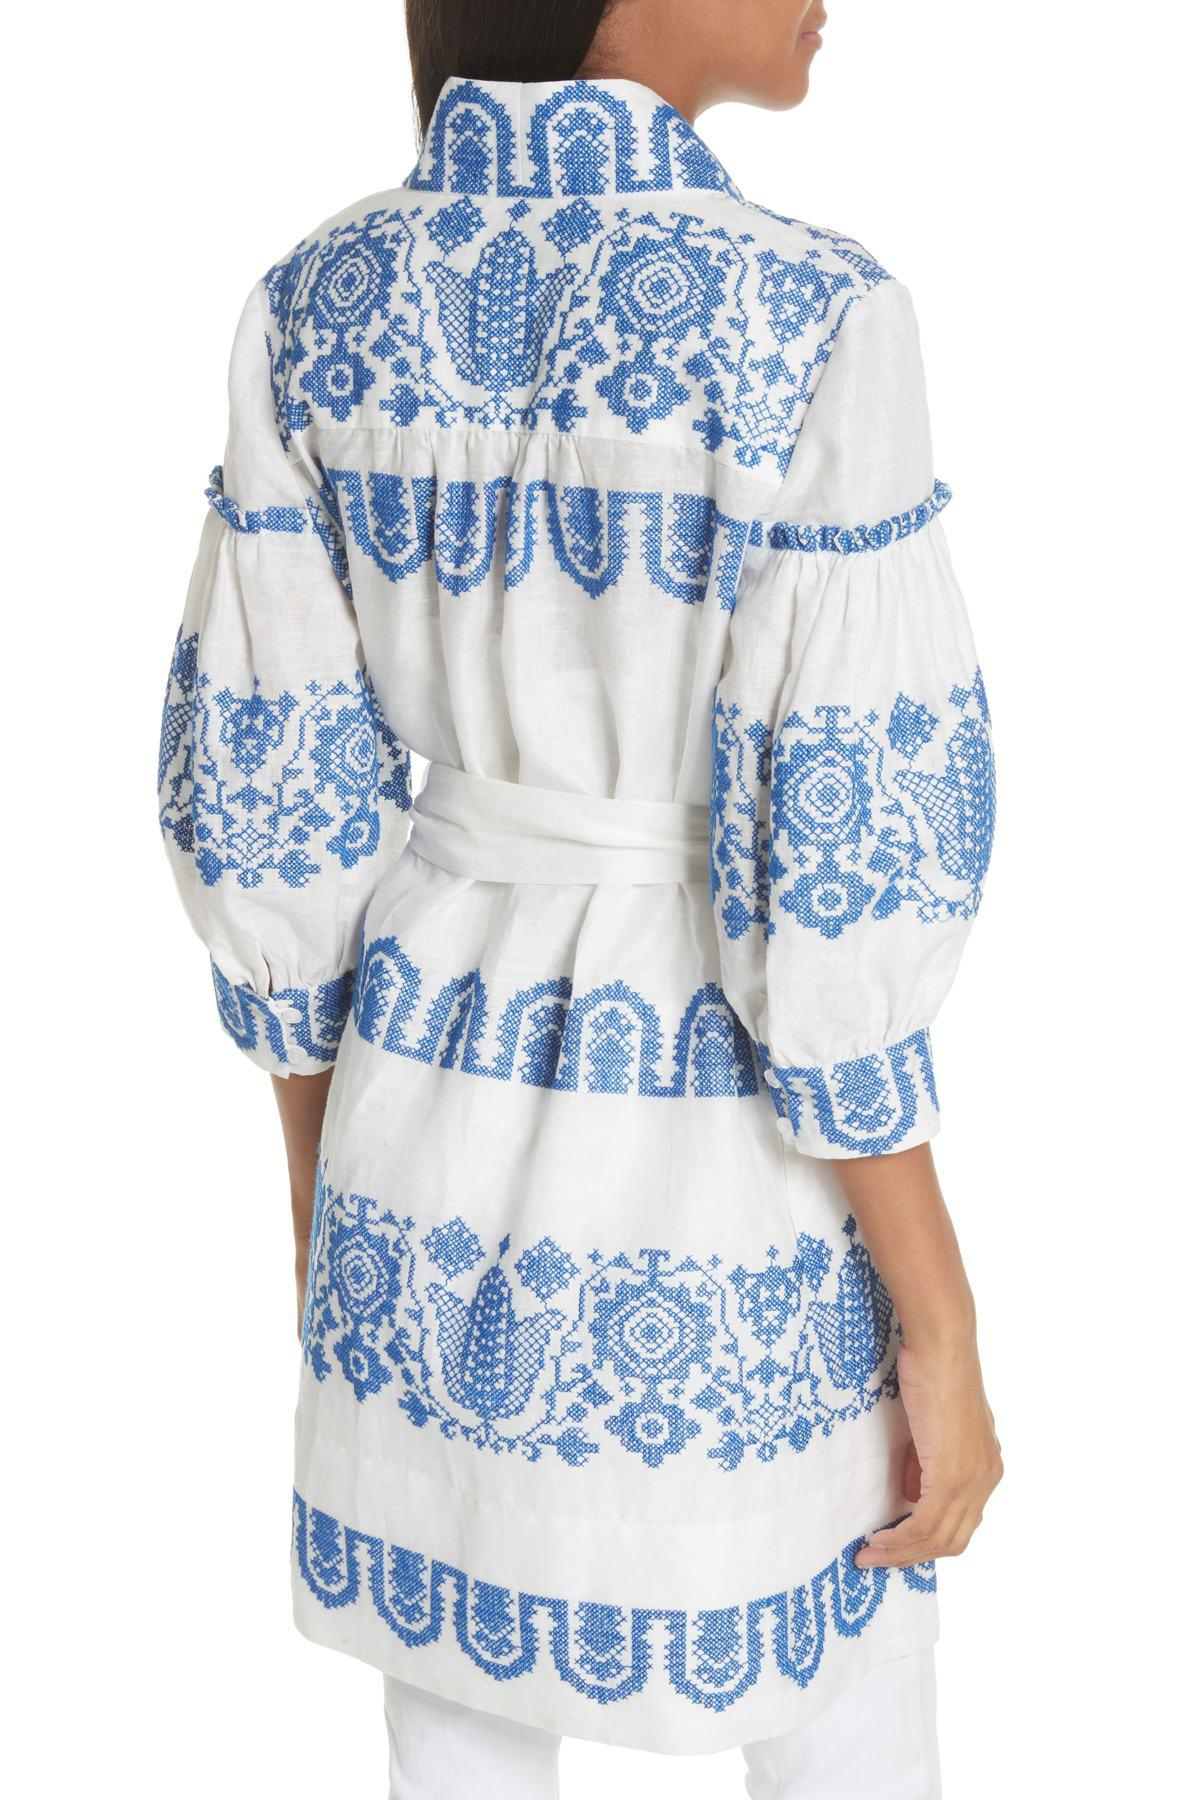 b9b32cb6d31 Lyst - MILLY Mykonos Embroidered Tie Waist Linen Dress in Blue